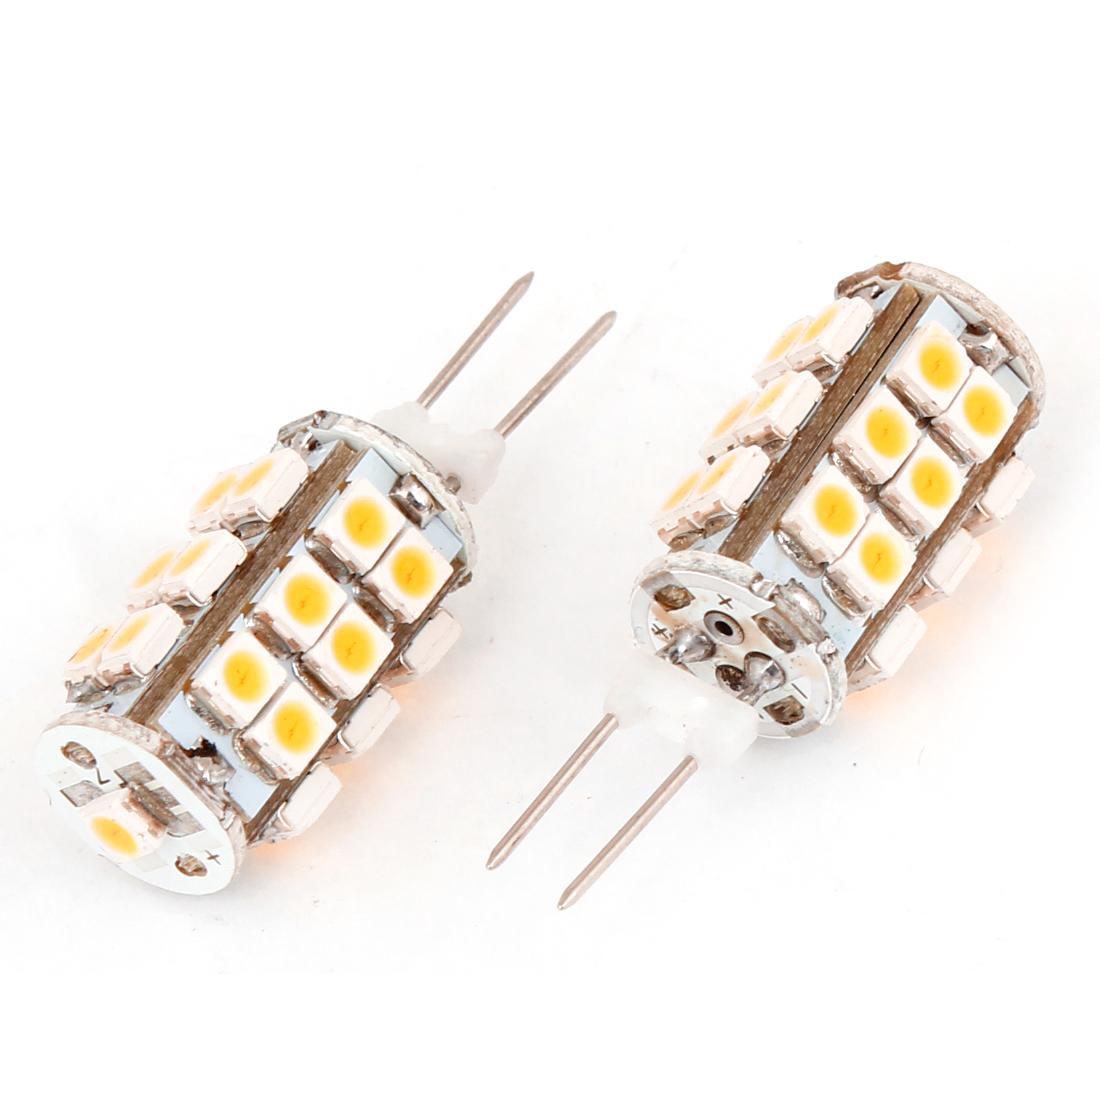 Unique Bargains 2 Pcs G4 Warm White 1210 SMD 25 LED Car Dashboard Light Lamp Bulbs